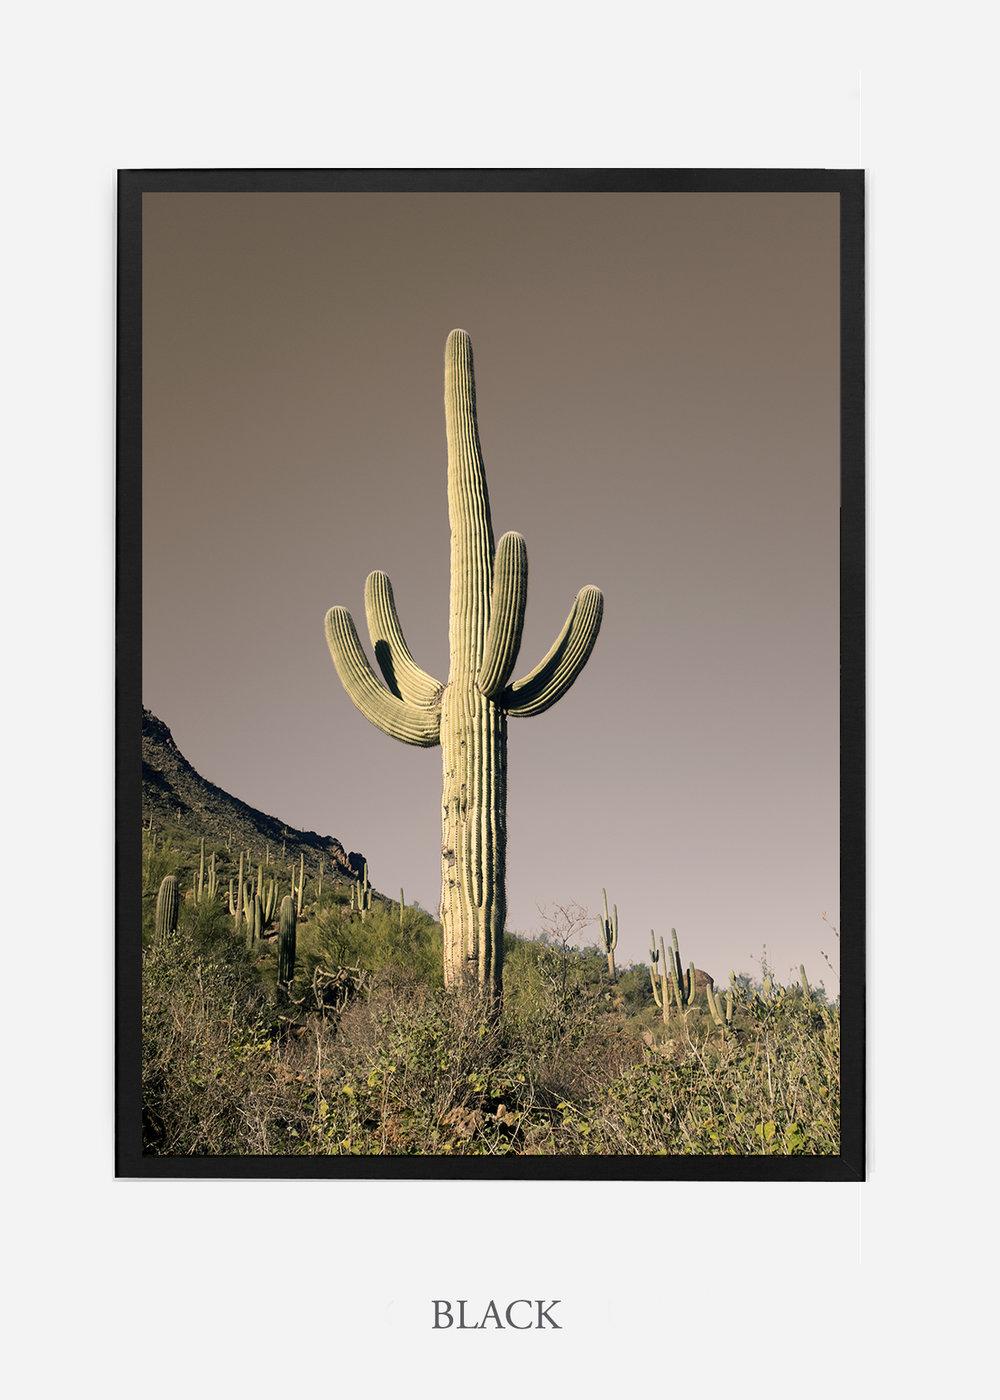 nomat-blackframe-saguaroNo.20-wildercalifornia-art-wallart-cactusprint-homedecor-prints-arizona-botanical-artwork-interiordesign.jpg